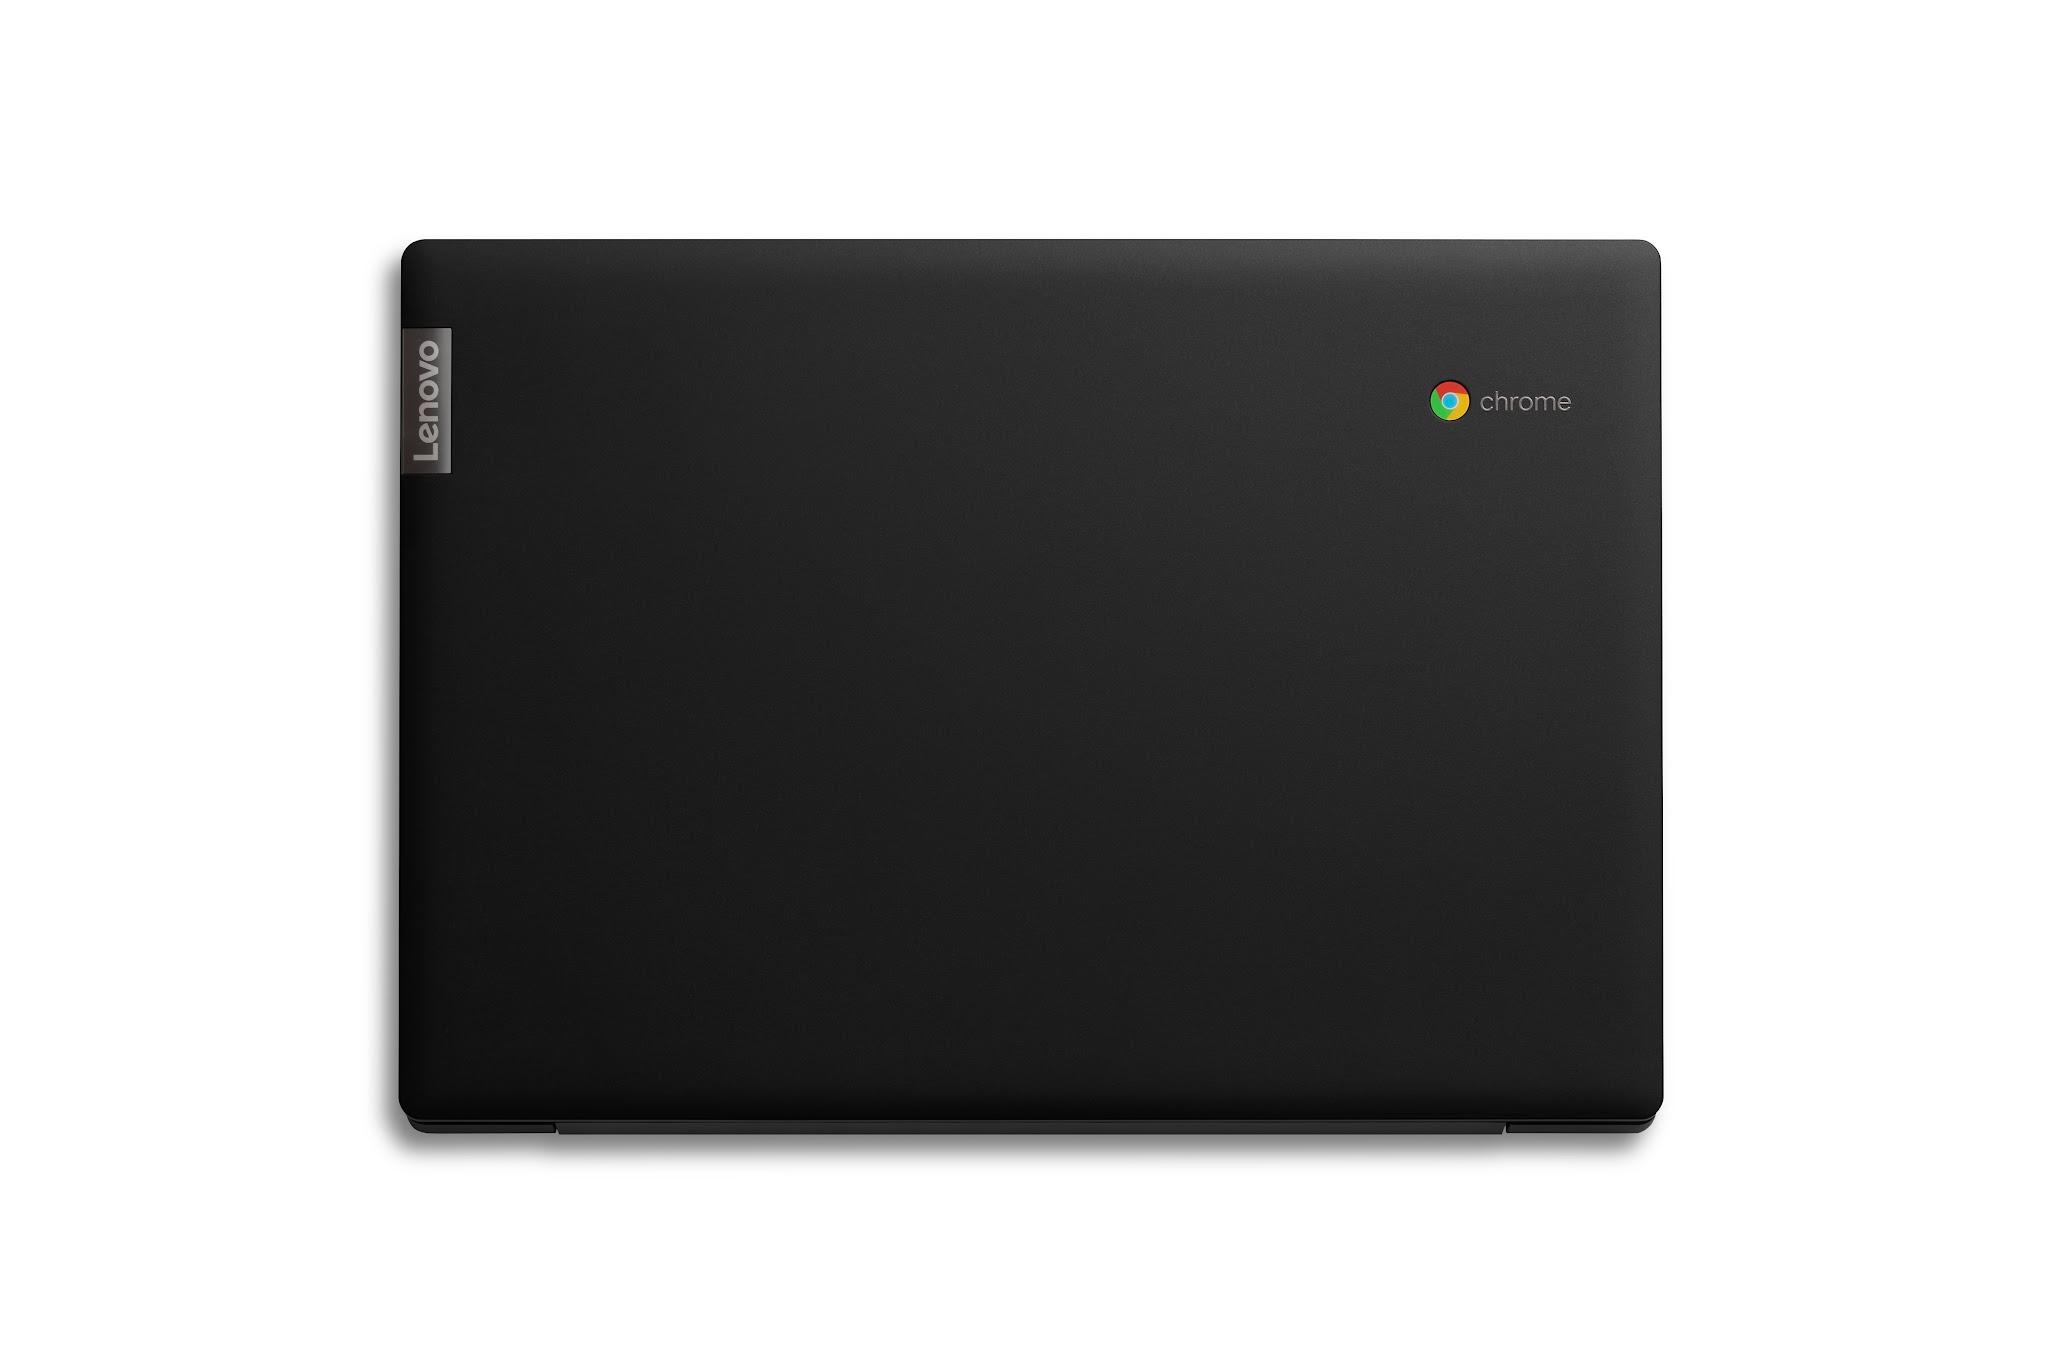 Lenovo Chromebook S340-14 - photo 12